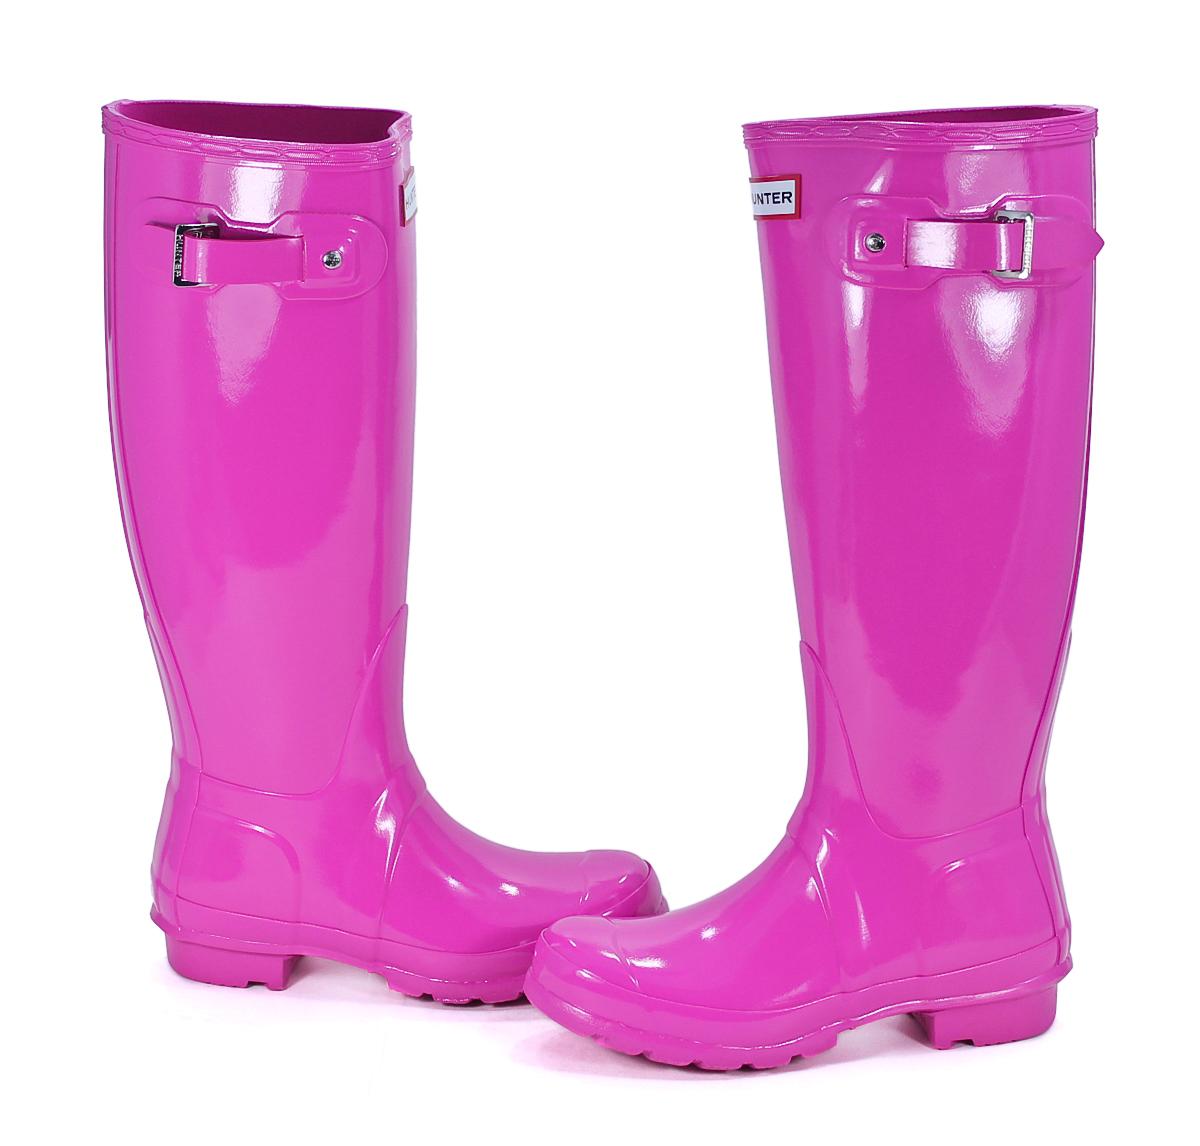 Unique UGGu00ae Womens Reignfall Rain Boots In Lipstick Red